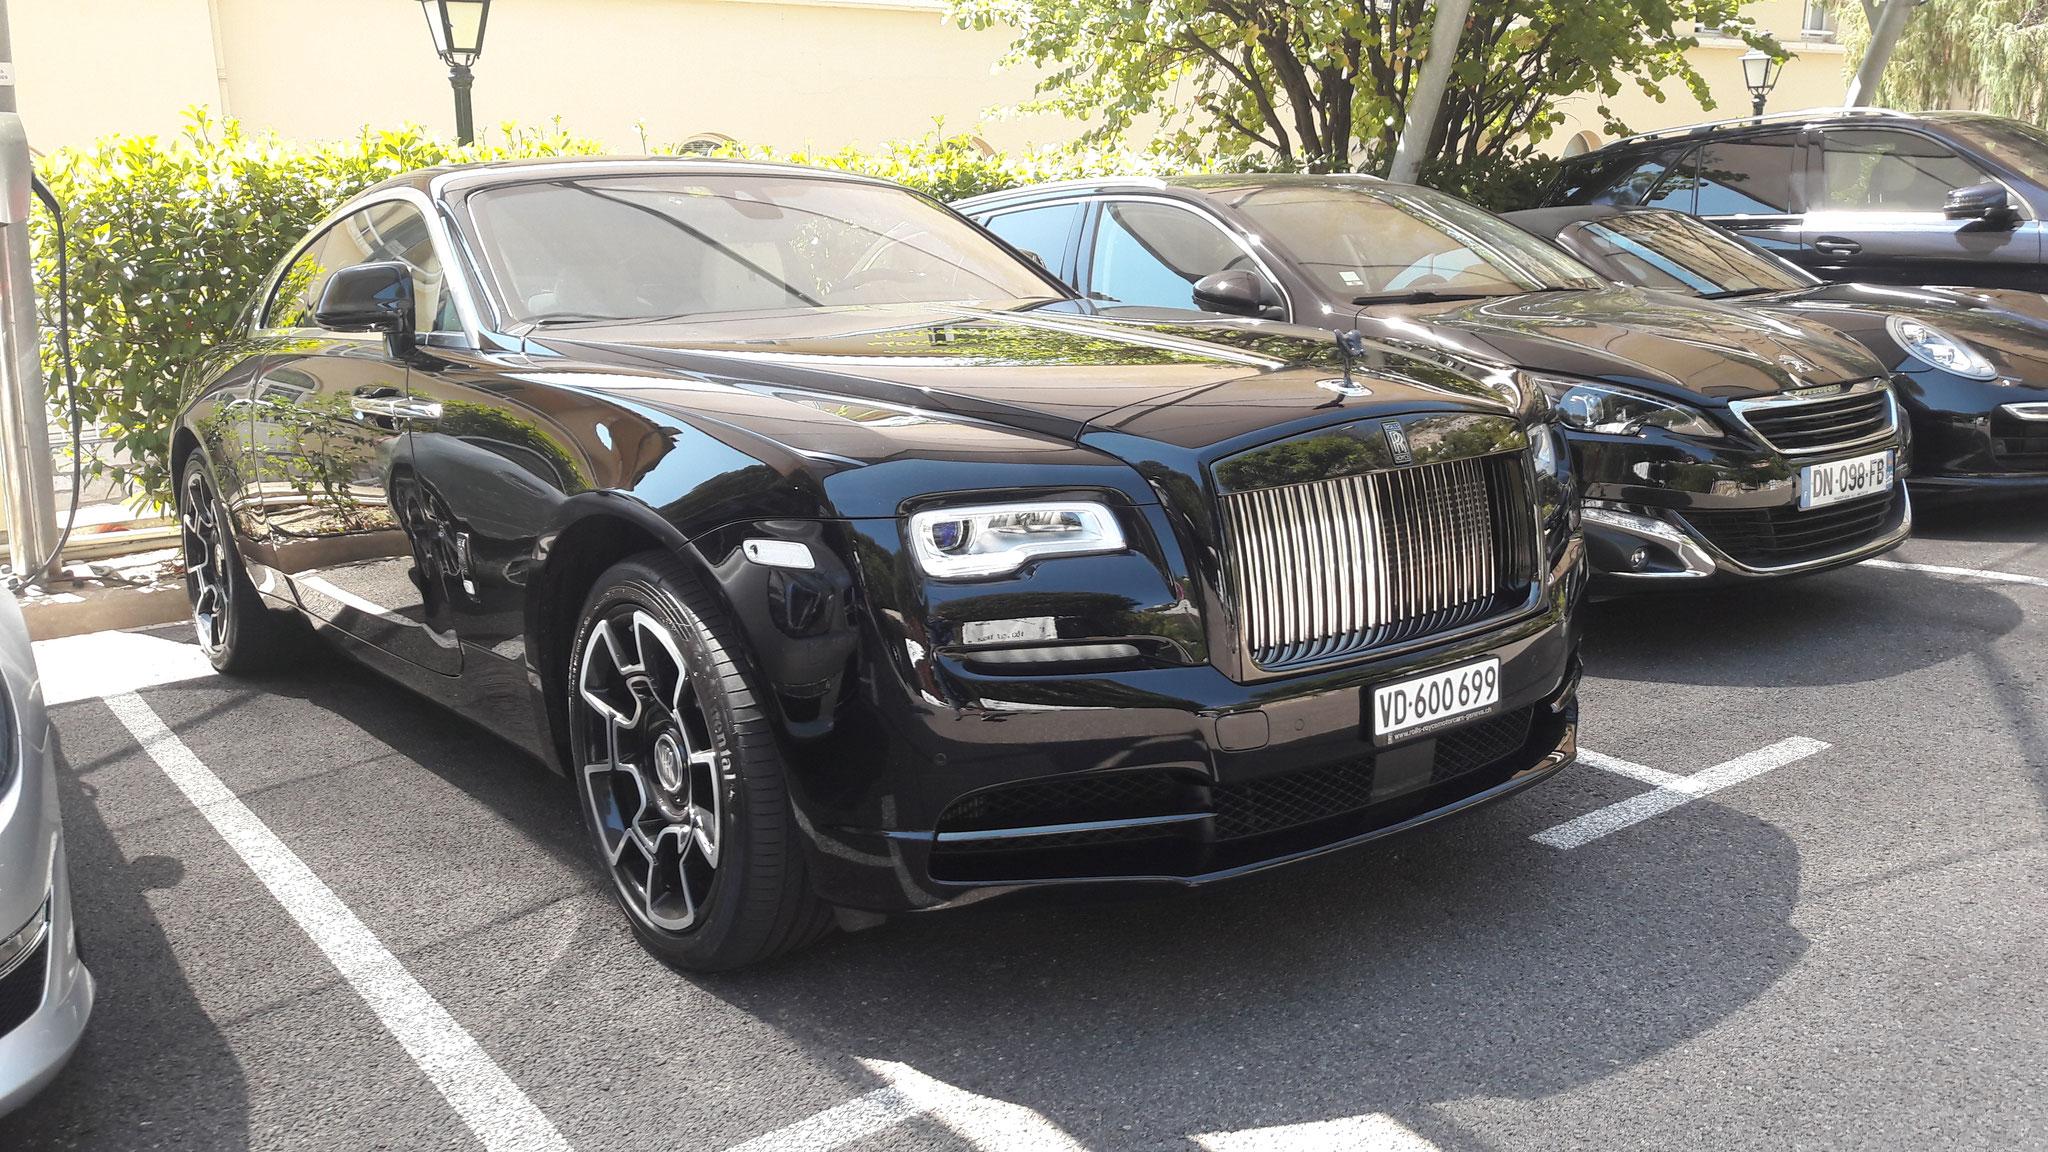 Rolls Royce Wraith Black Badge - VD-600699 (CH)